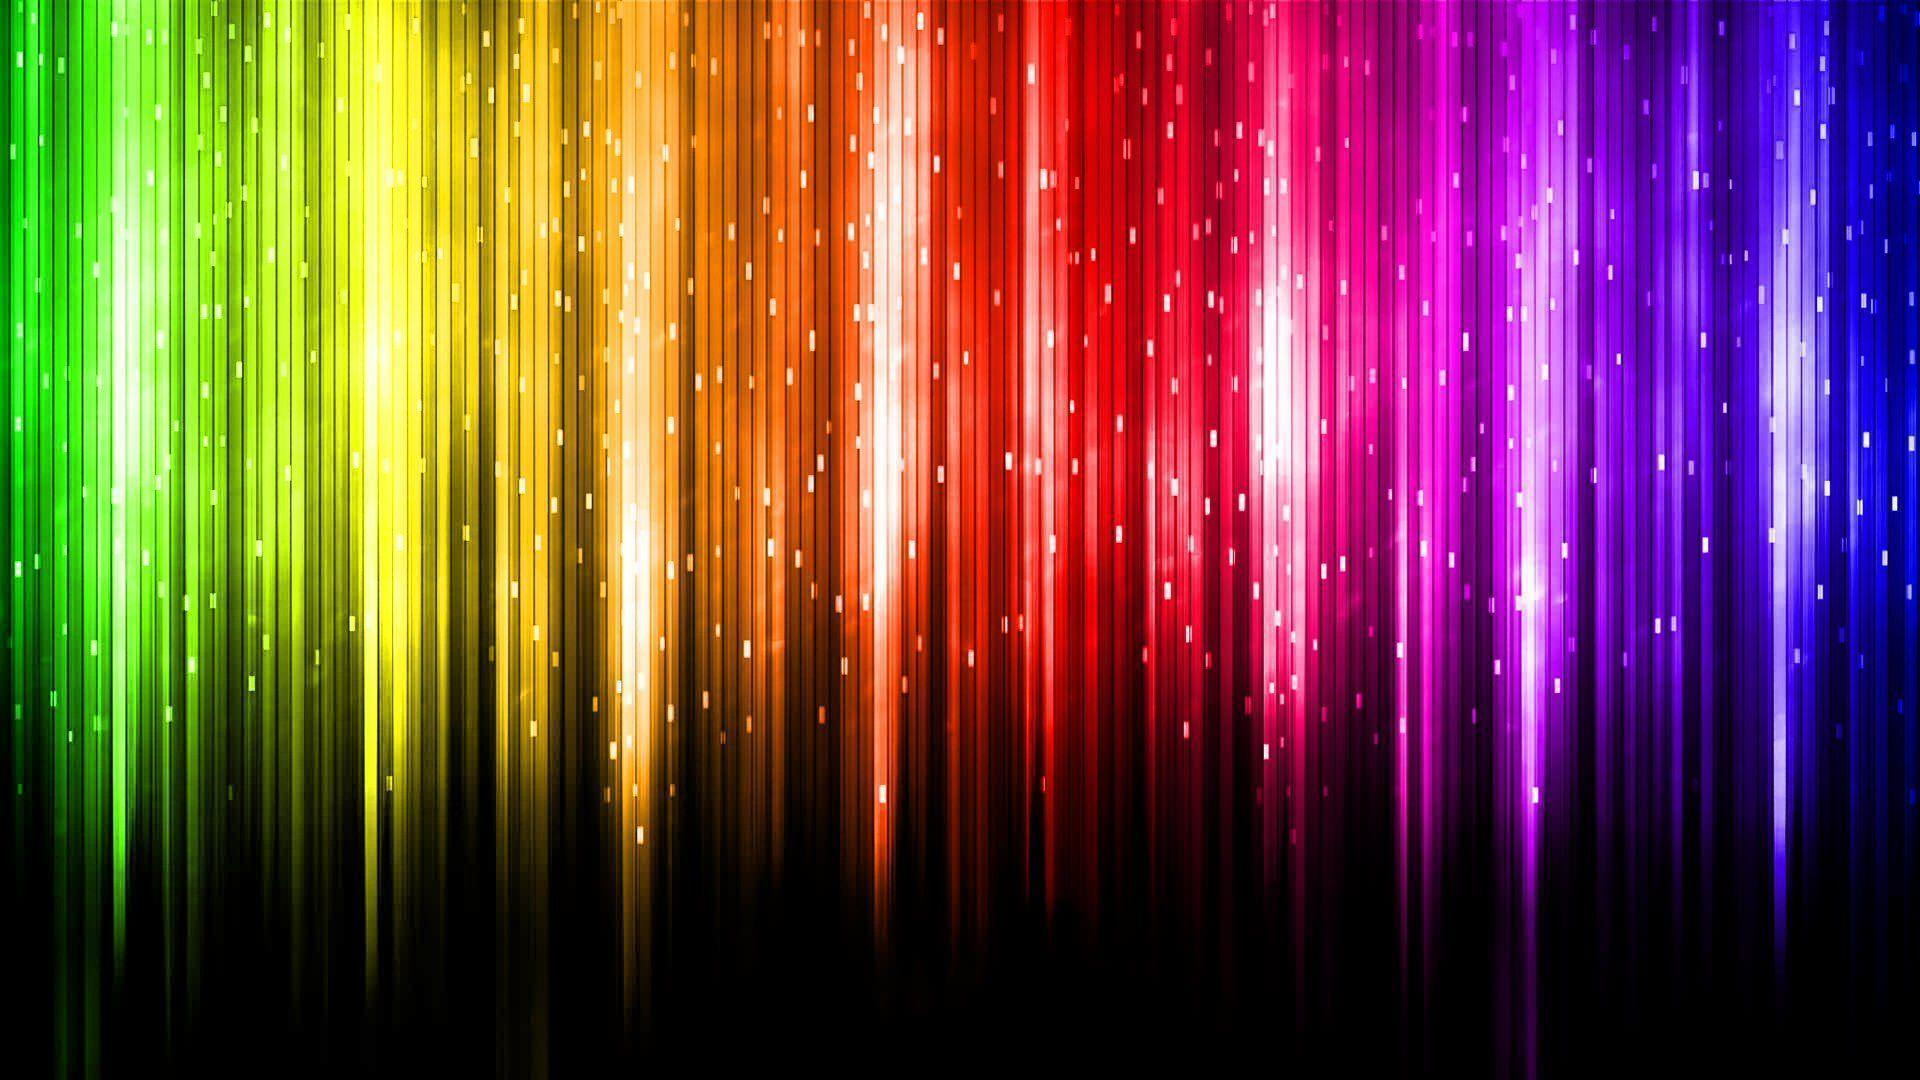 rainbow wave length wallpapers - photo #21